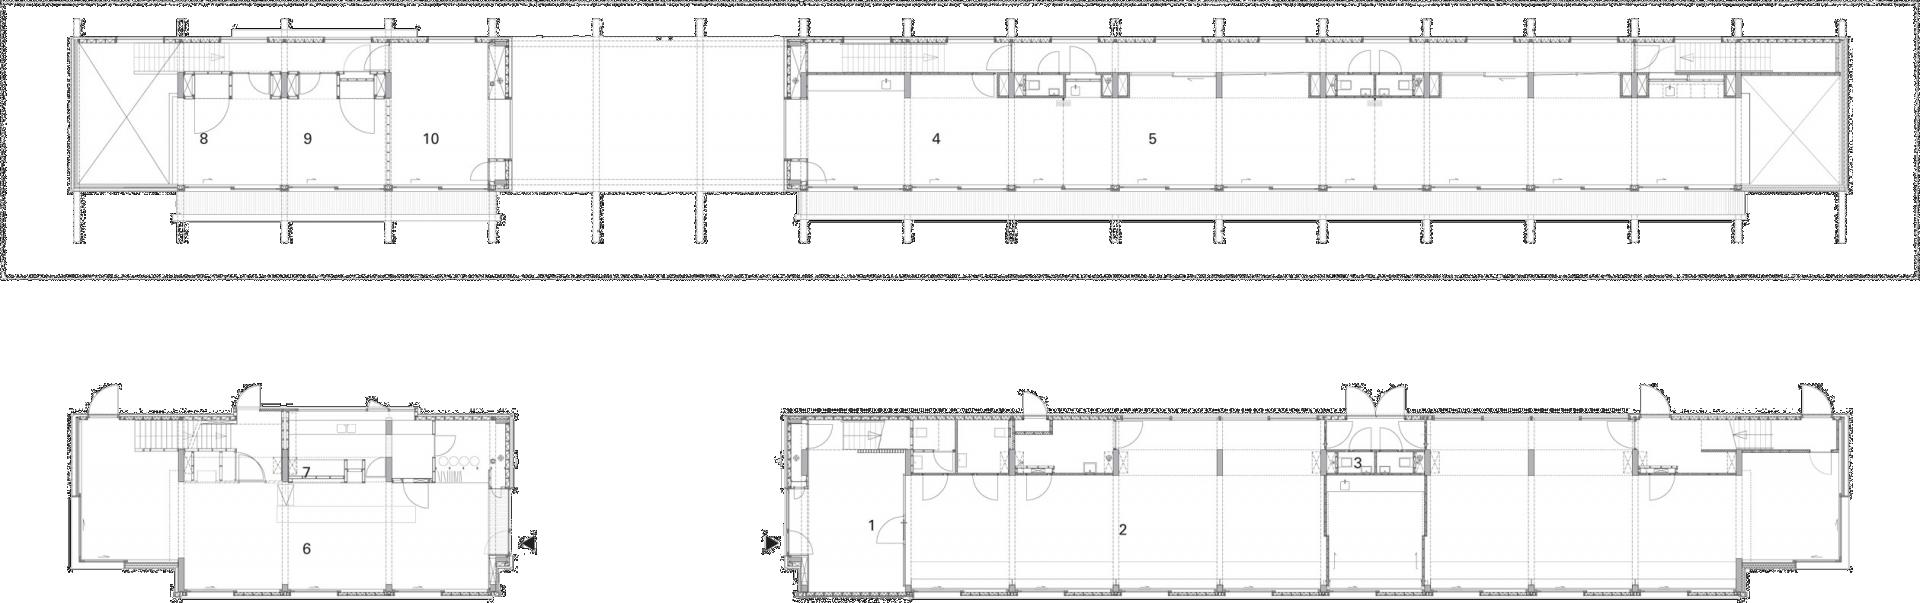 Rowing Building Plan